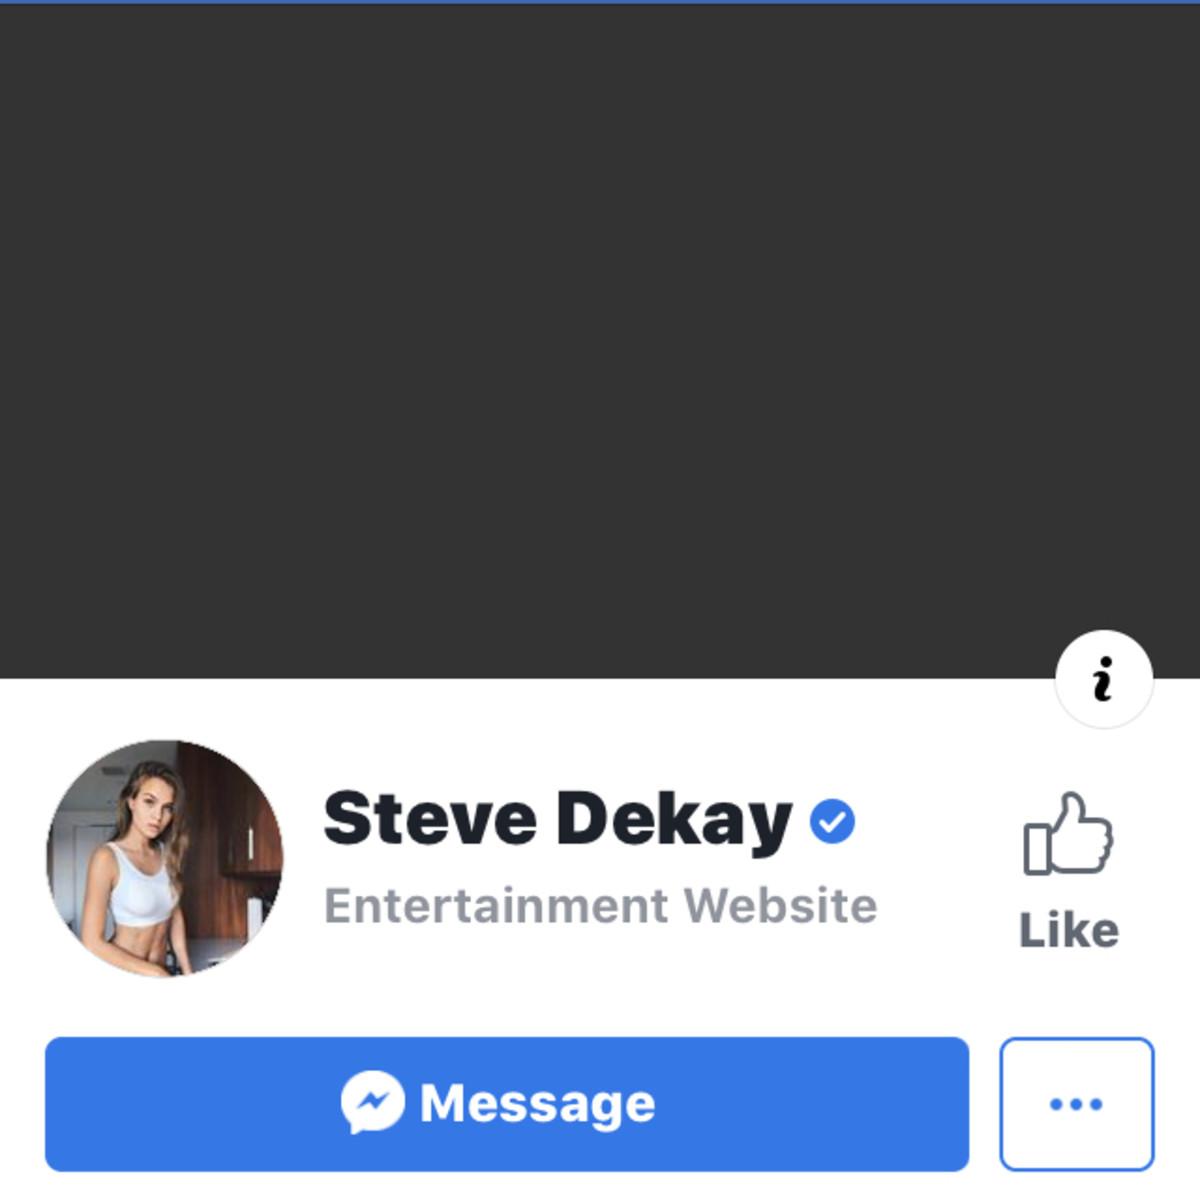 Steve Dekay Fraudulent Facebook Page.